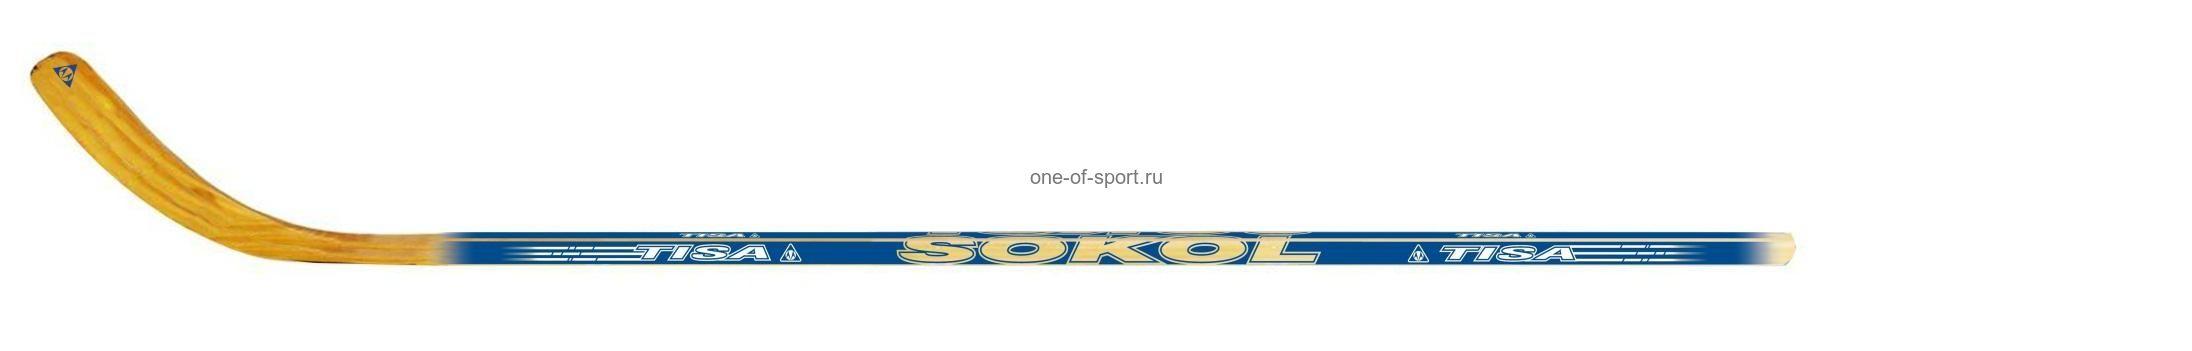 Клюшка хоккейная Tisa Sokol JR арт.Е72074